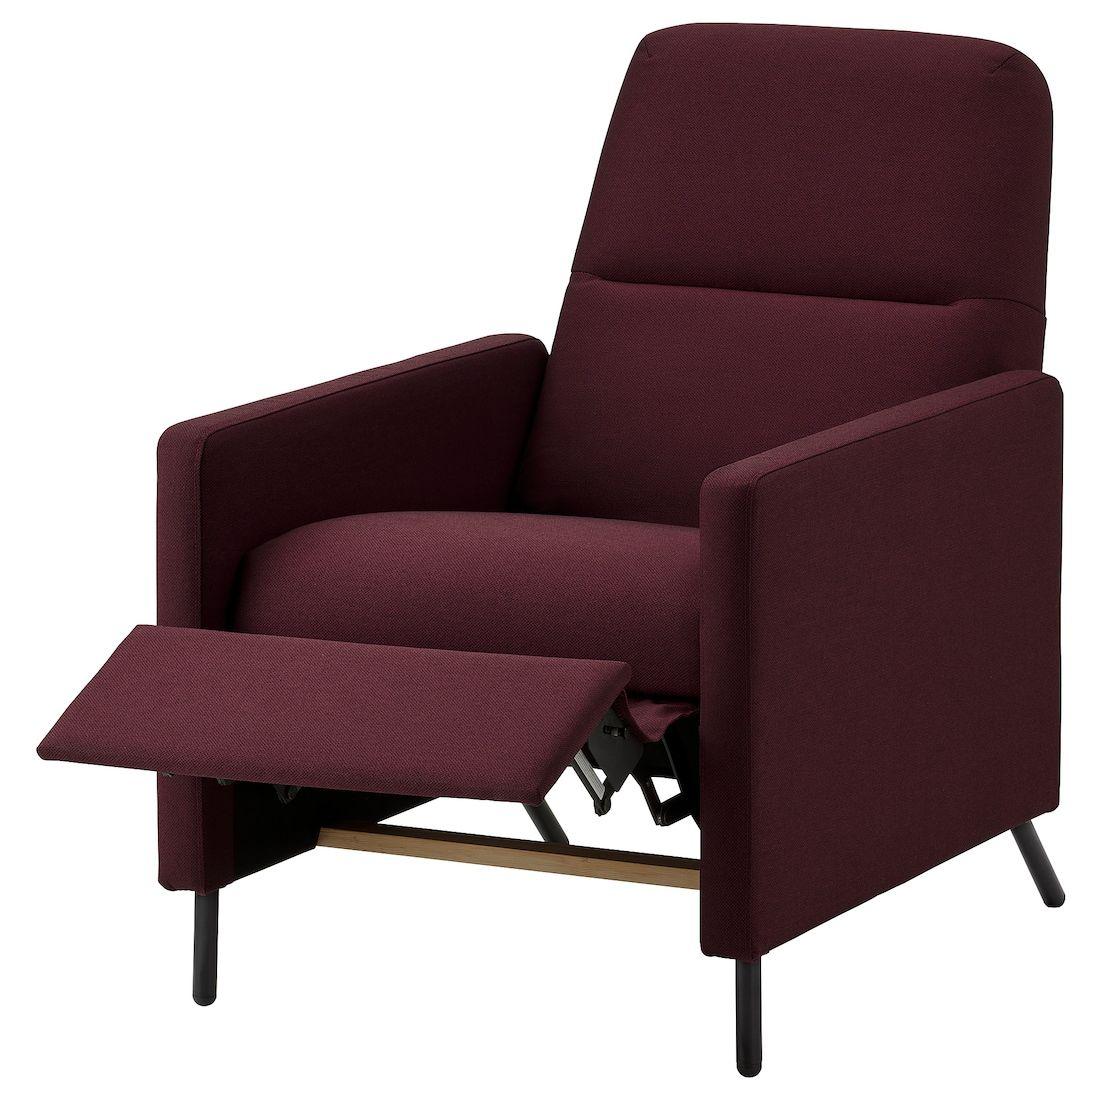 Gistad Recliner Idekulla Dark Red Ikea In 2020 Recliner Reclining Armchair Recliner Chair